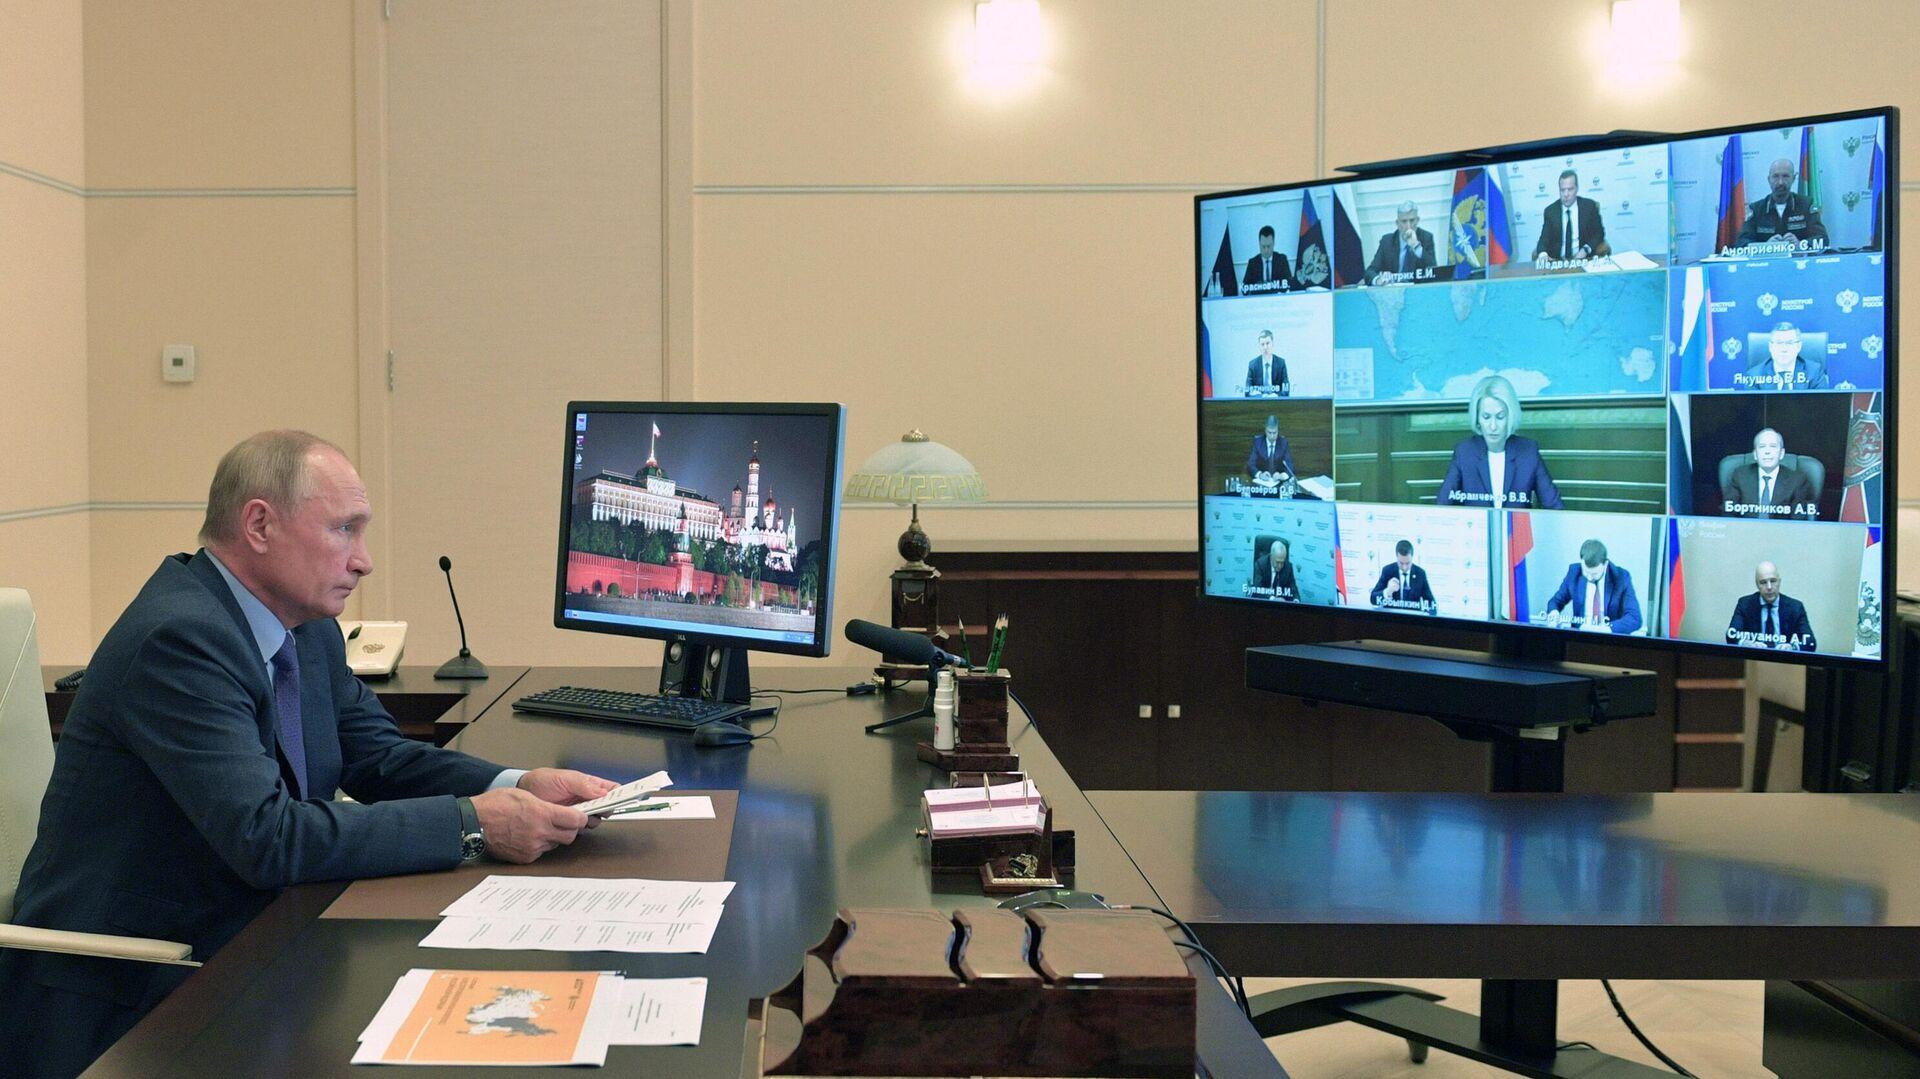 Президент РФ Владимир Путин в режиме видеоконференции провел совещание о развитии и декриминализации лесного комплекса - РИА Новости, 1920, 30.09.2020